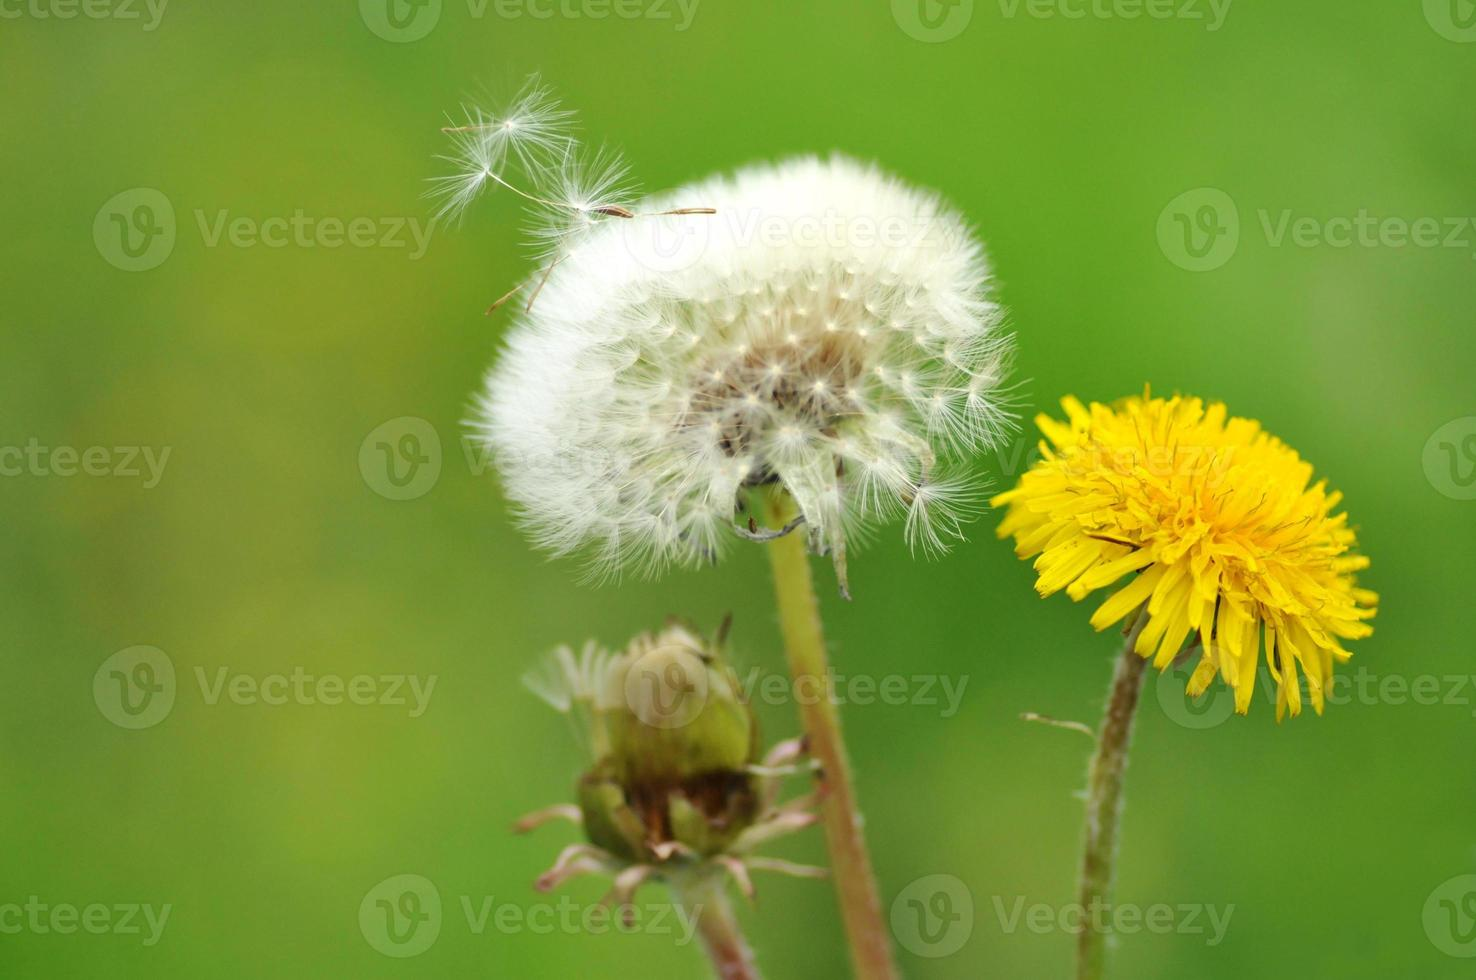 Dandelion that skip seed photo